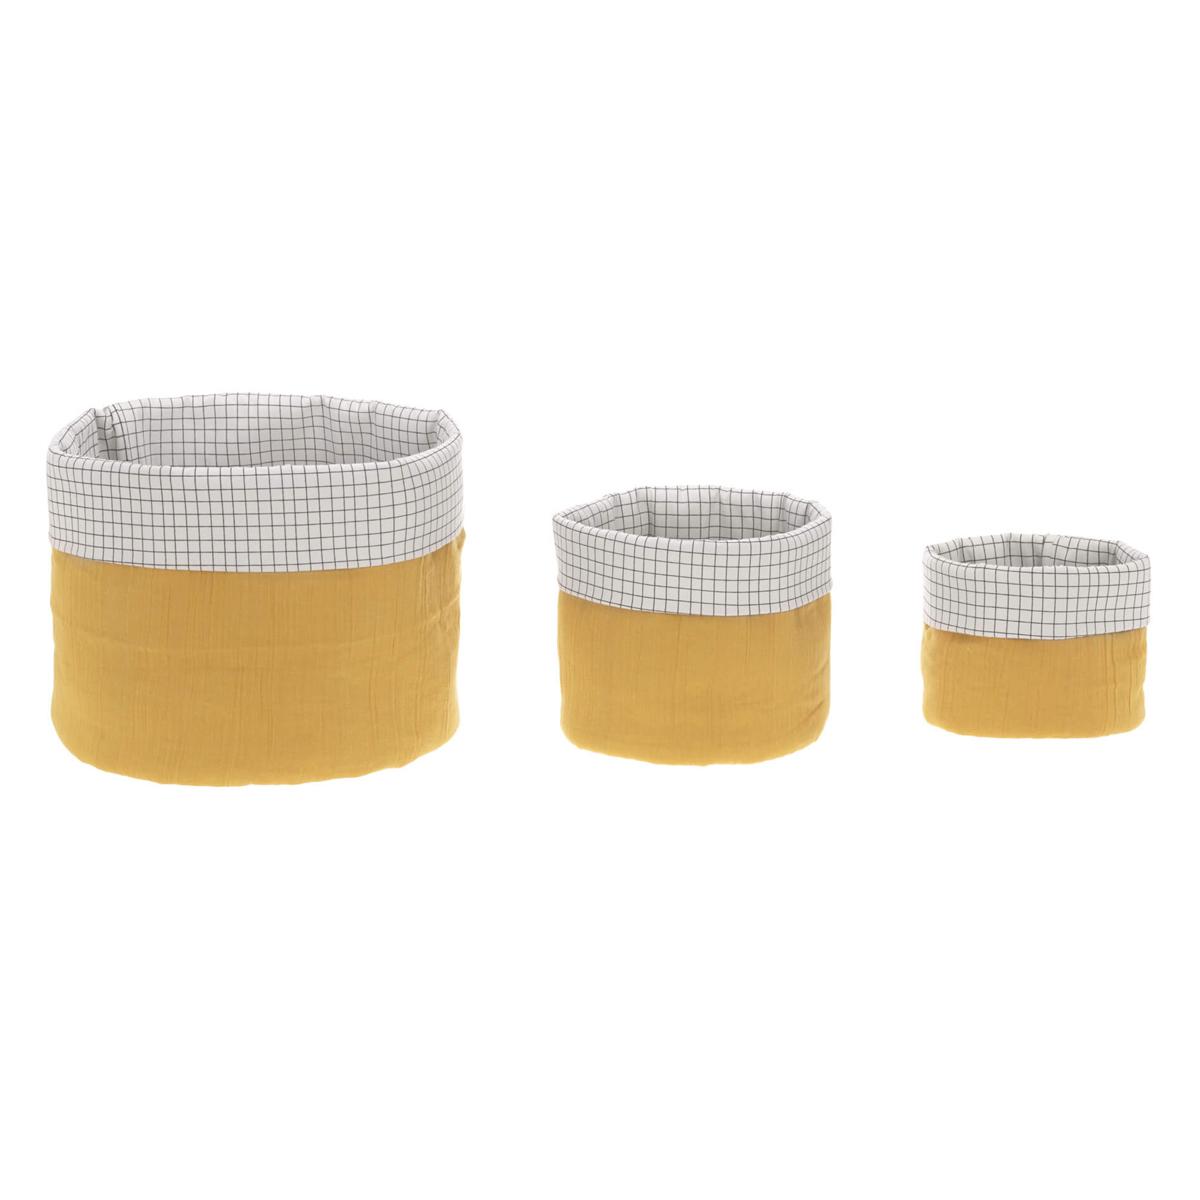 Panier & corbeille Lot de 3 Paniers de Rangement - Moutarde Lot de 3 Paniers de Rangement - Moutarde